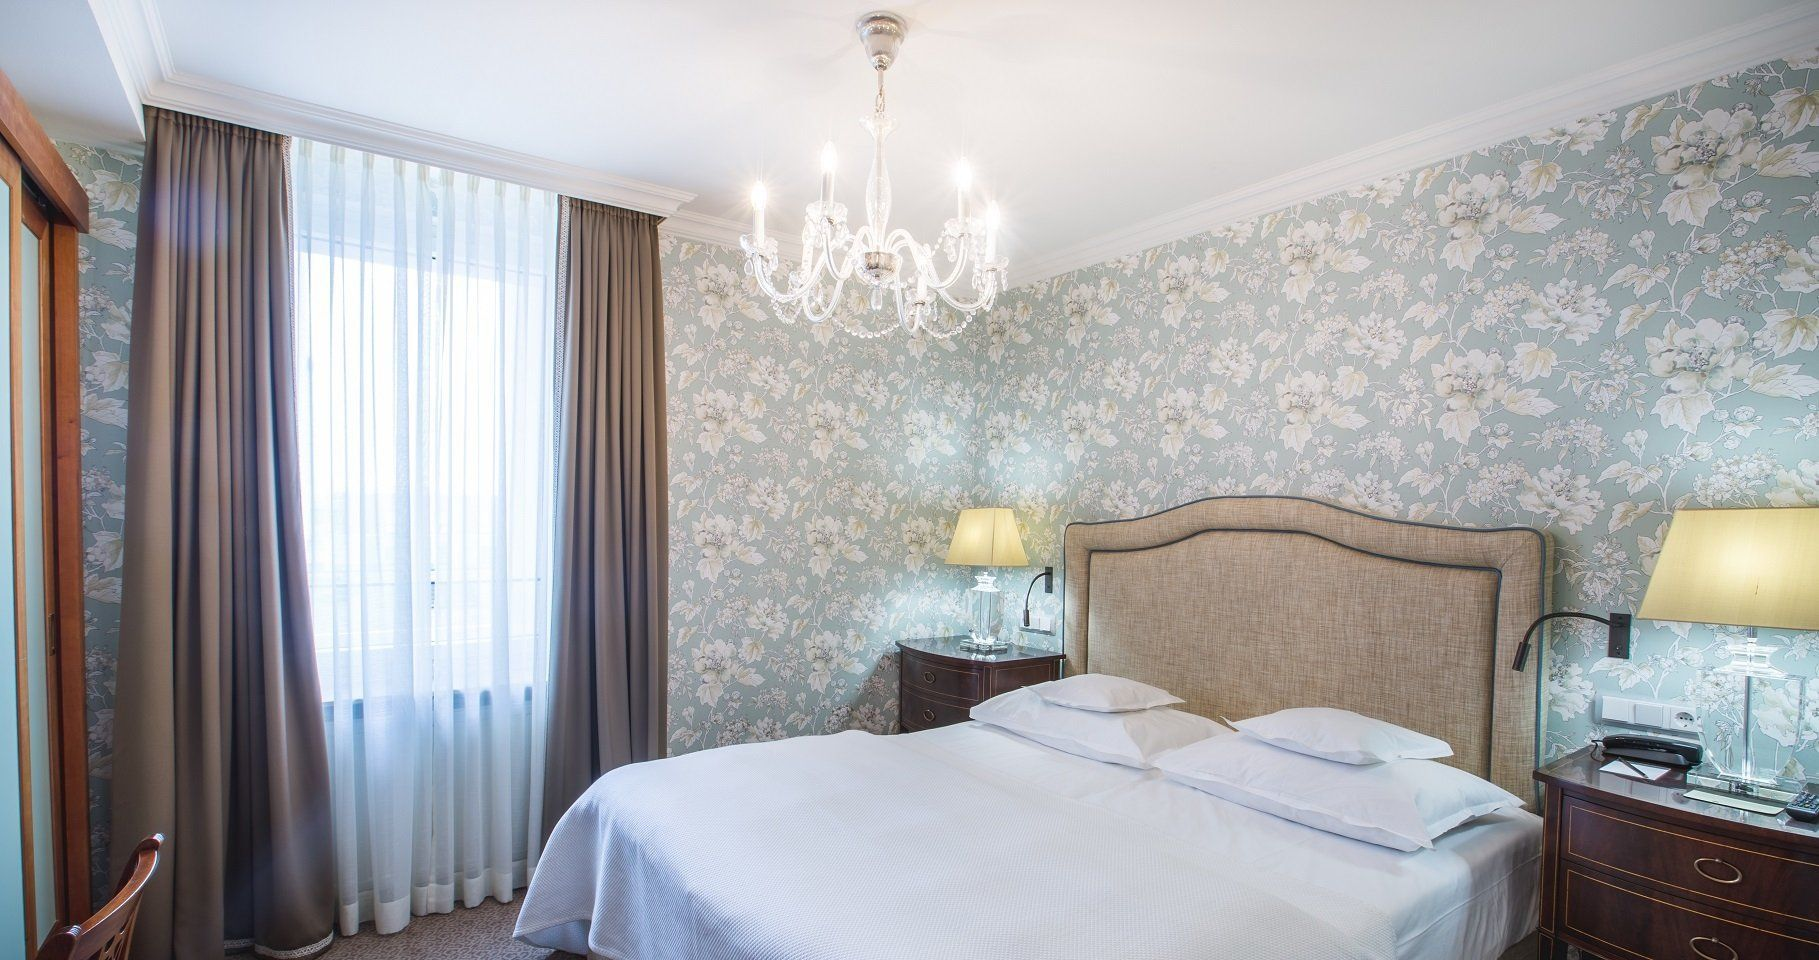 grandhotel hessischer hof in frankfurt main germany a 5